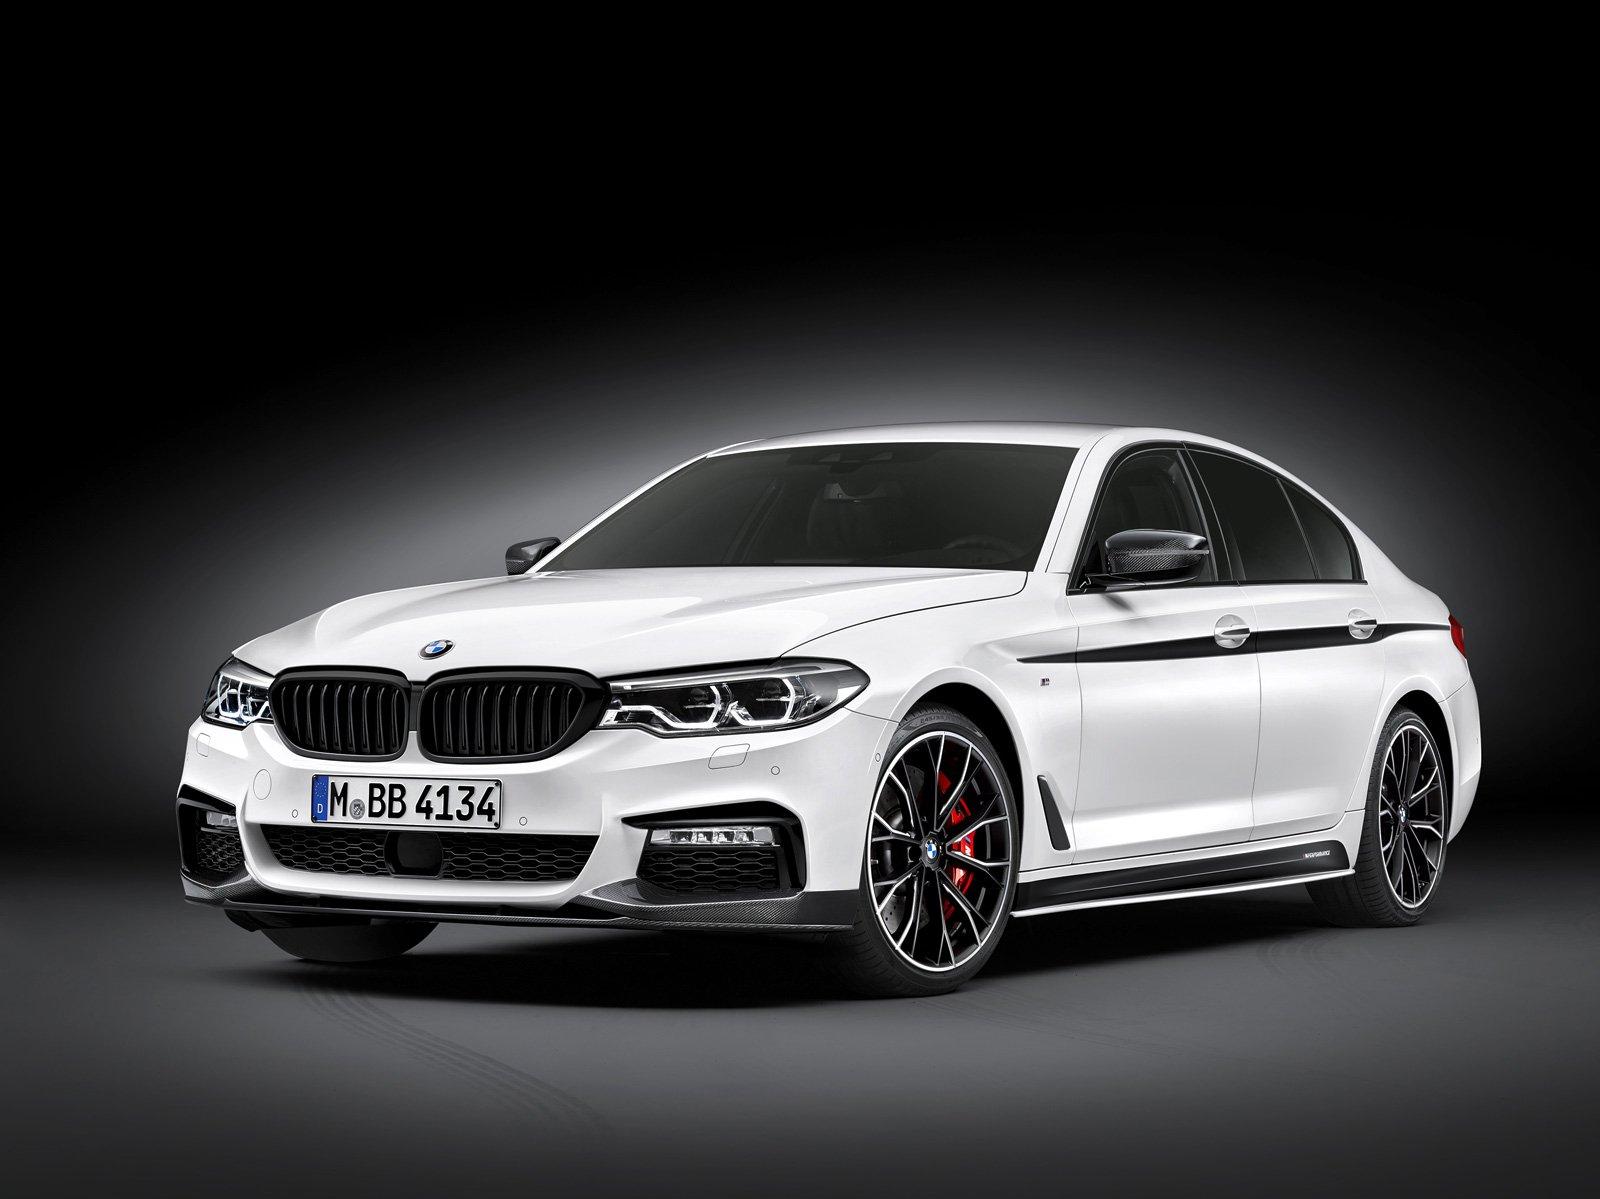 New BMW 5 Series Gets Loads of M Performance Accesssories